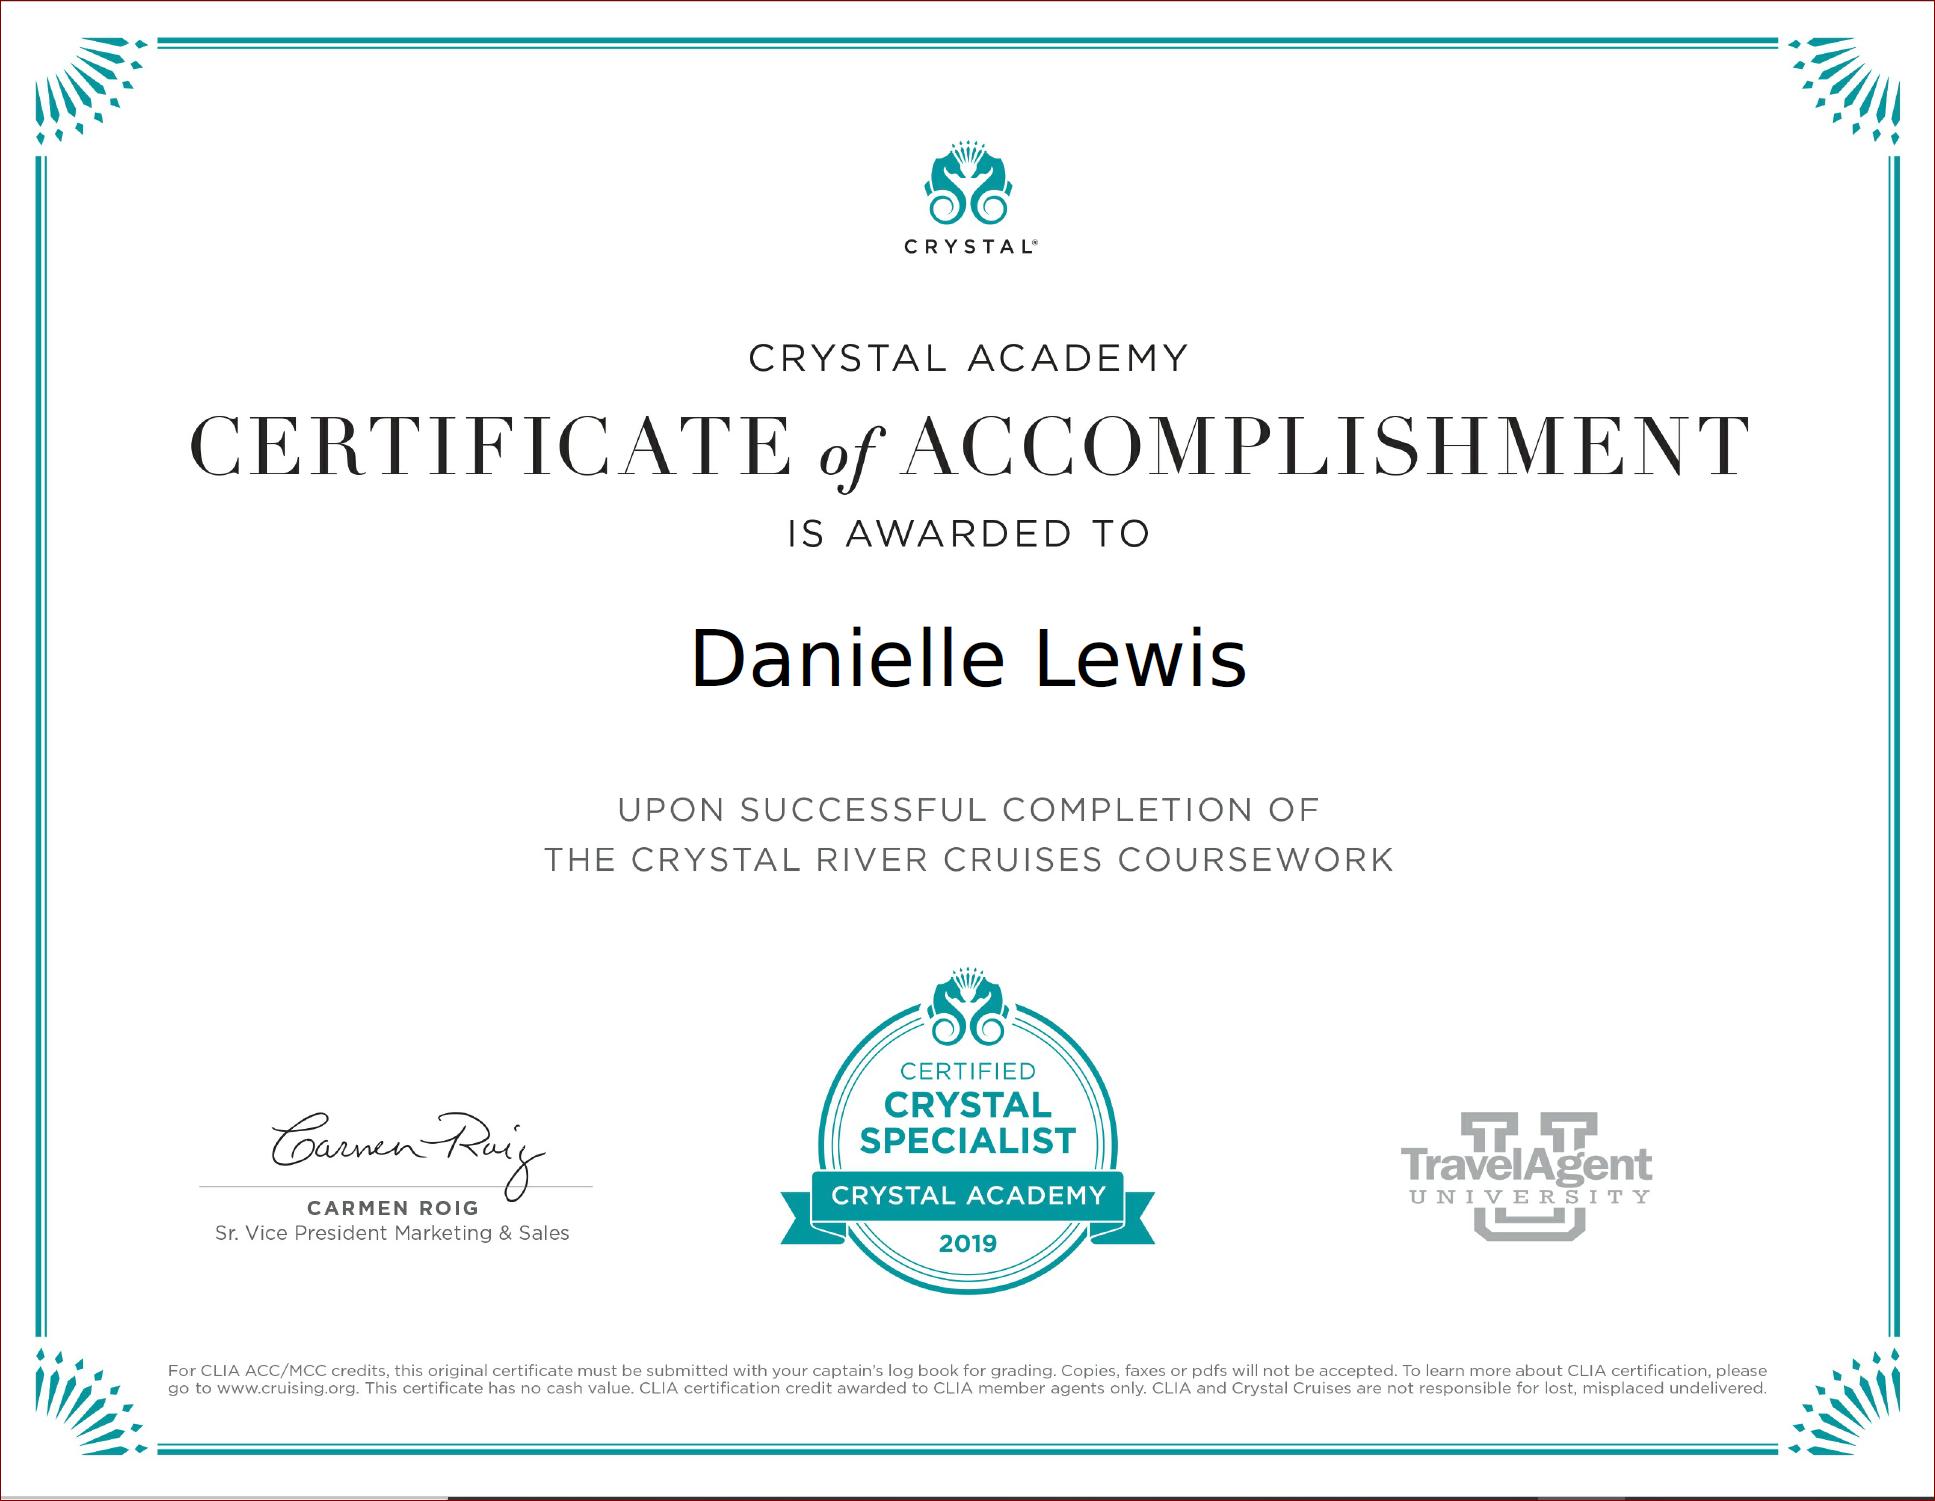 SelfishMe Travel - Crystal Cruises Crystal River Cruises certificate